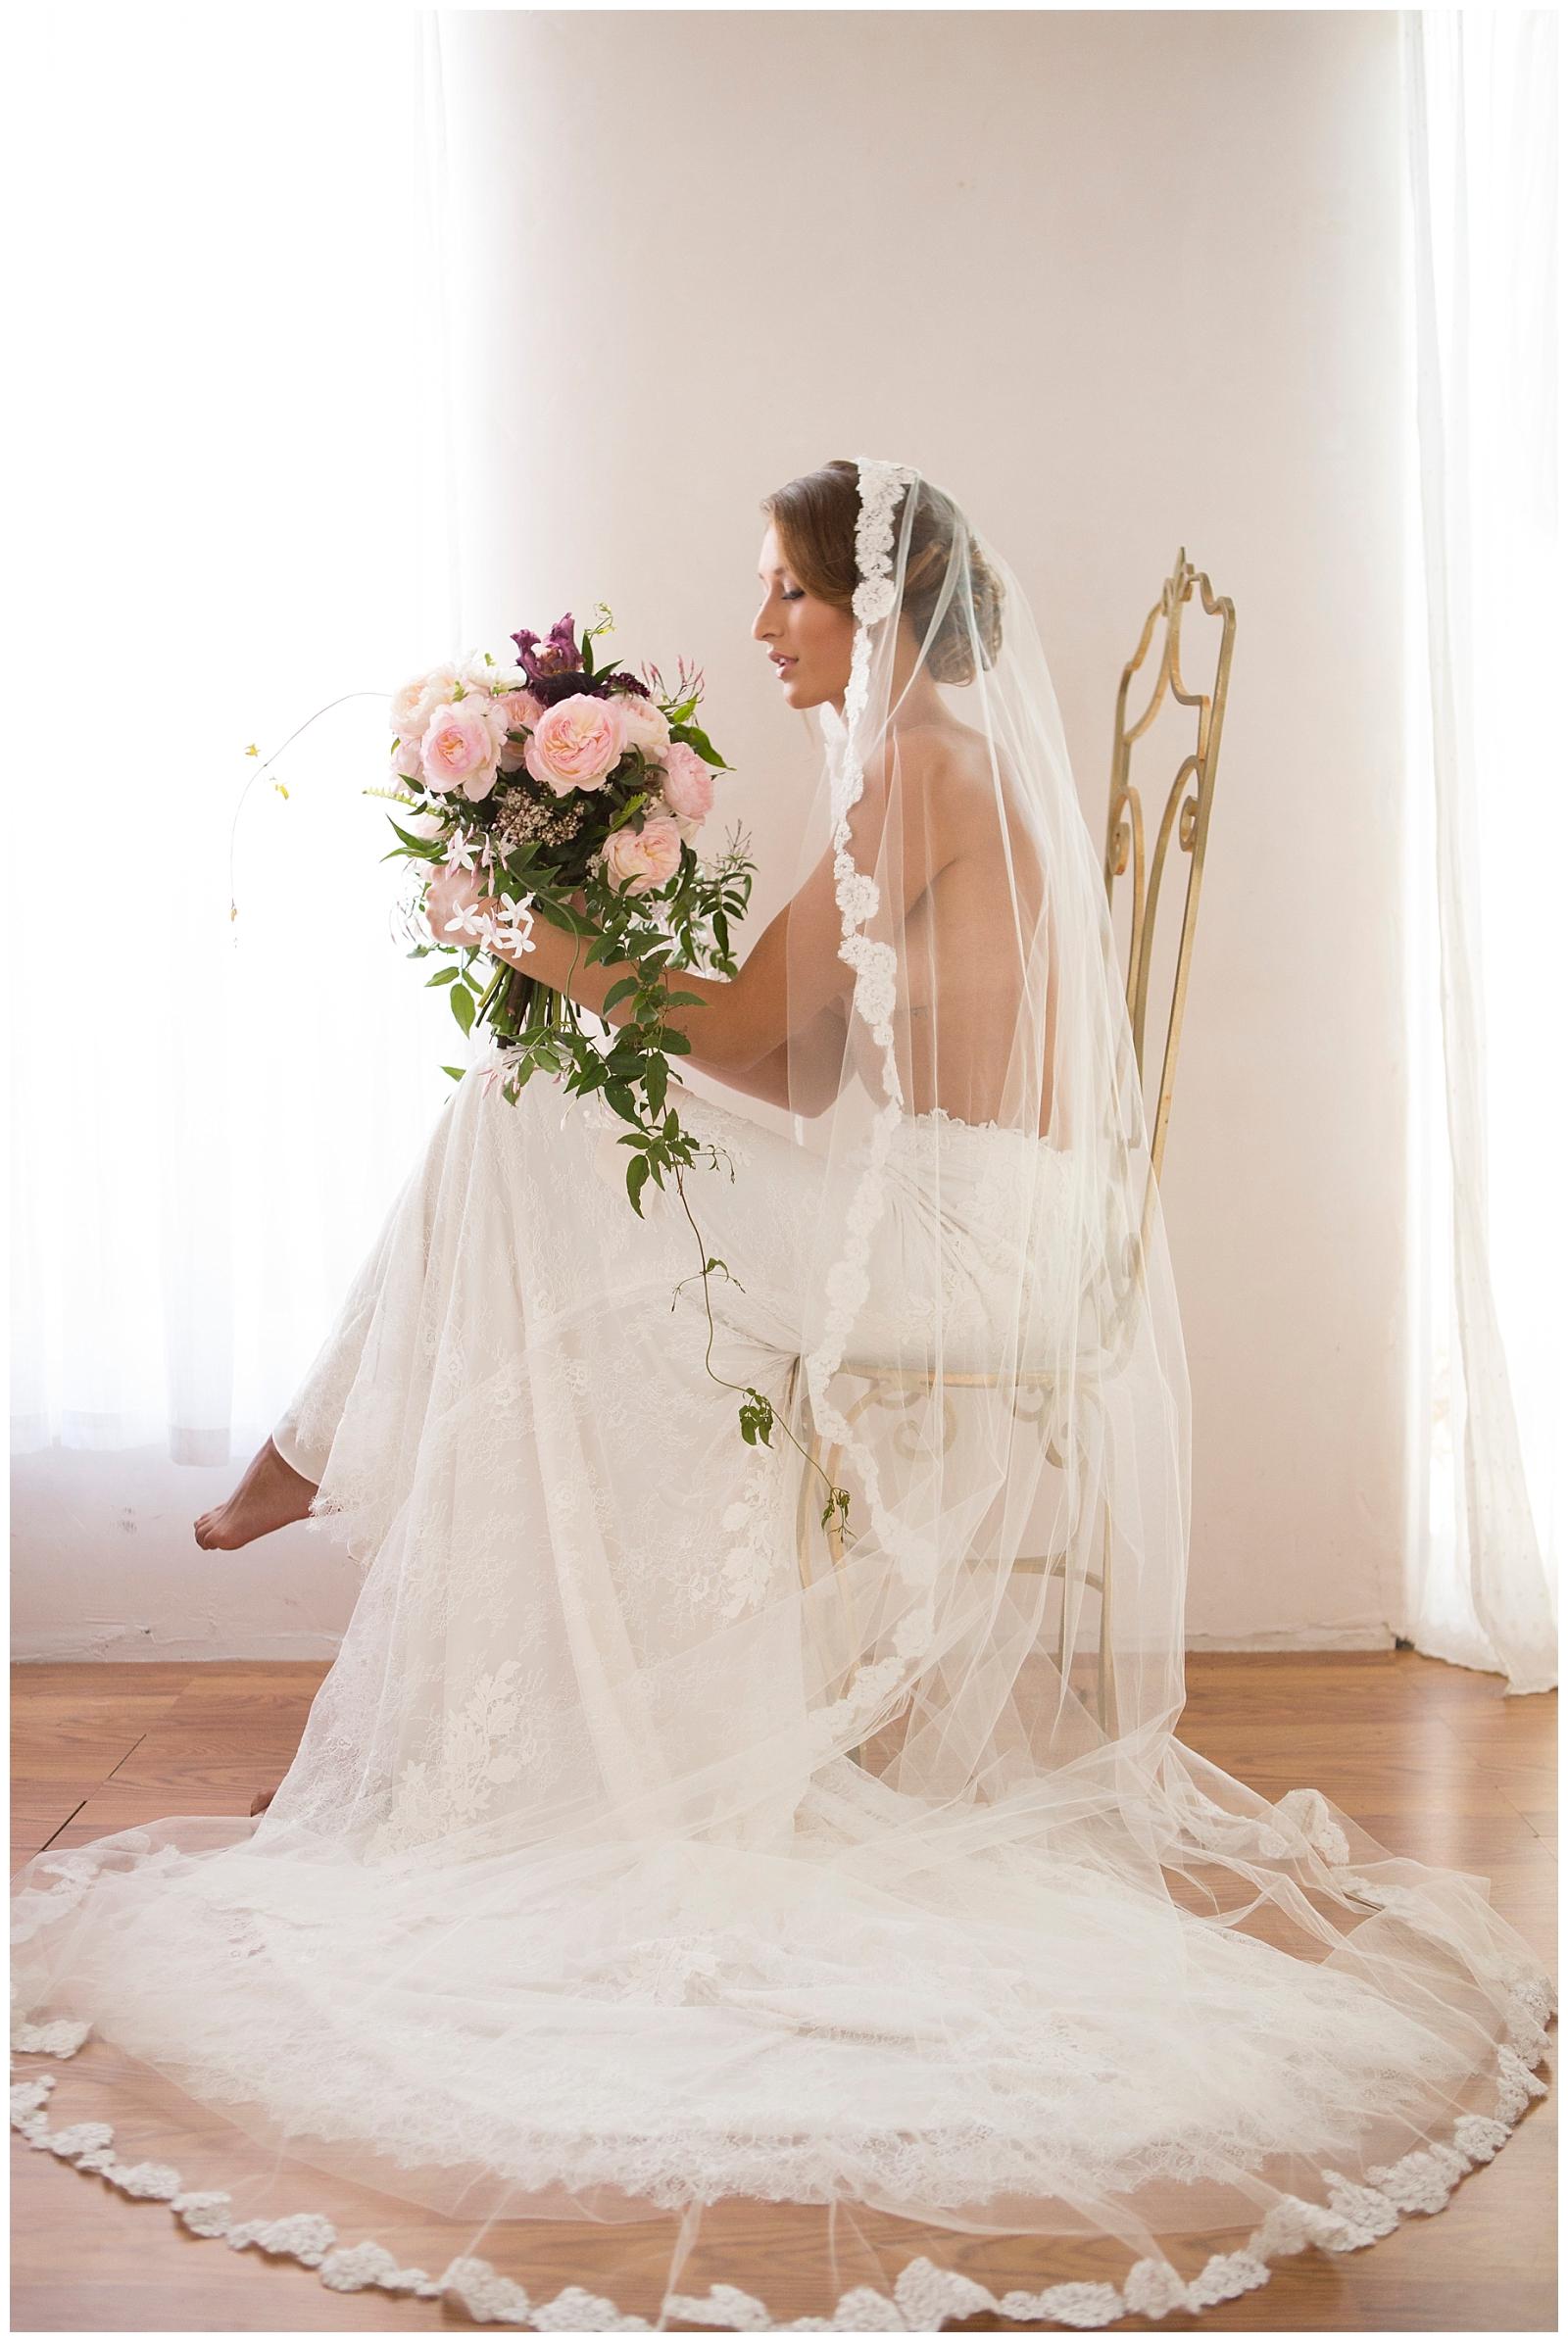 Veil-Inspiration-Epiphany-Wedding-Dress-Boudoir-Cover-Carol-Oliva-Photography.jpg